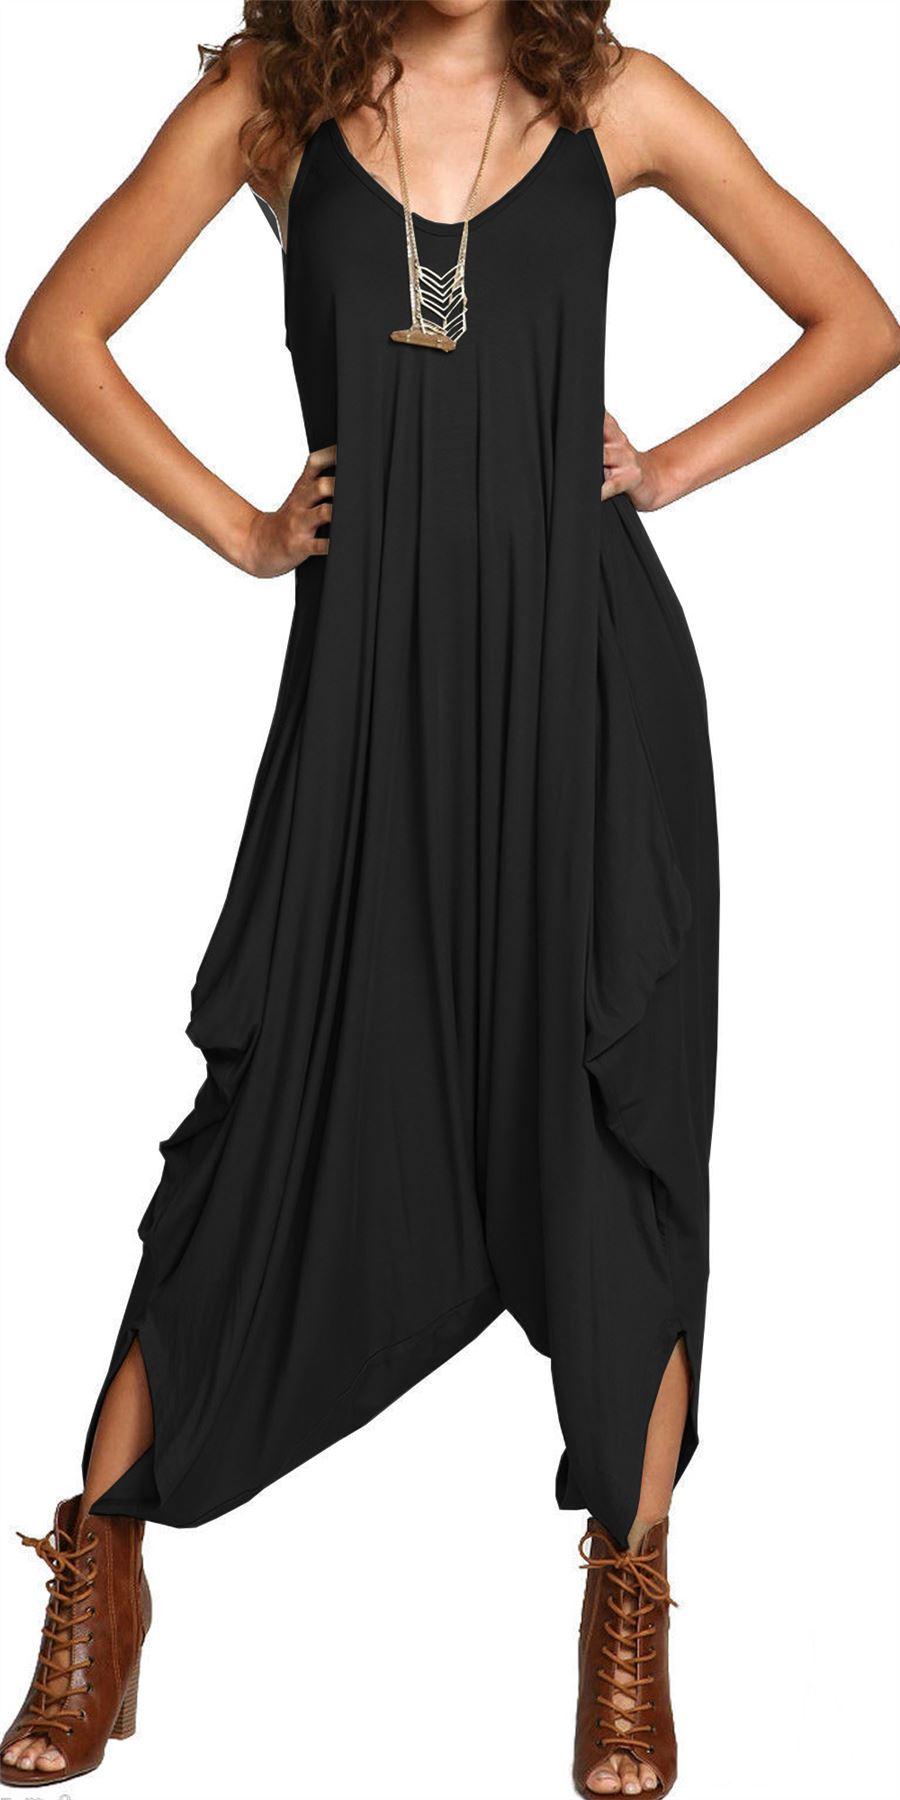 Unique Womens Hooded Onesies All In Ones Jumpsuits Pyjamas Ladies Girls Size UK 6 - 16 | EBay